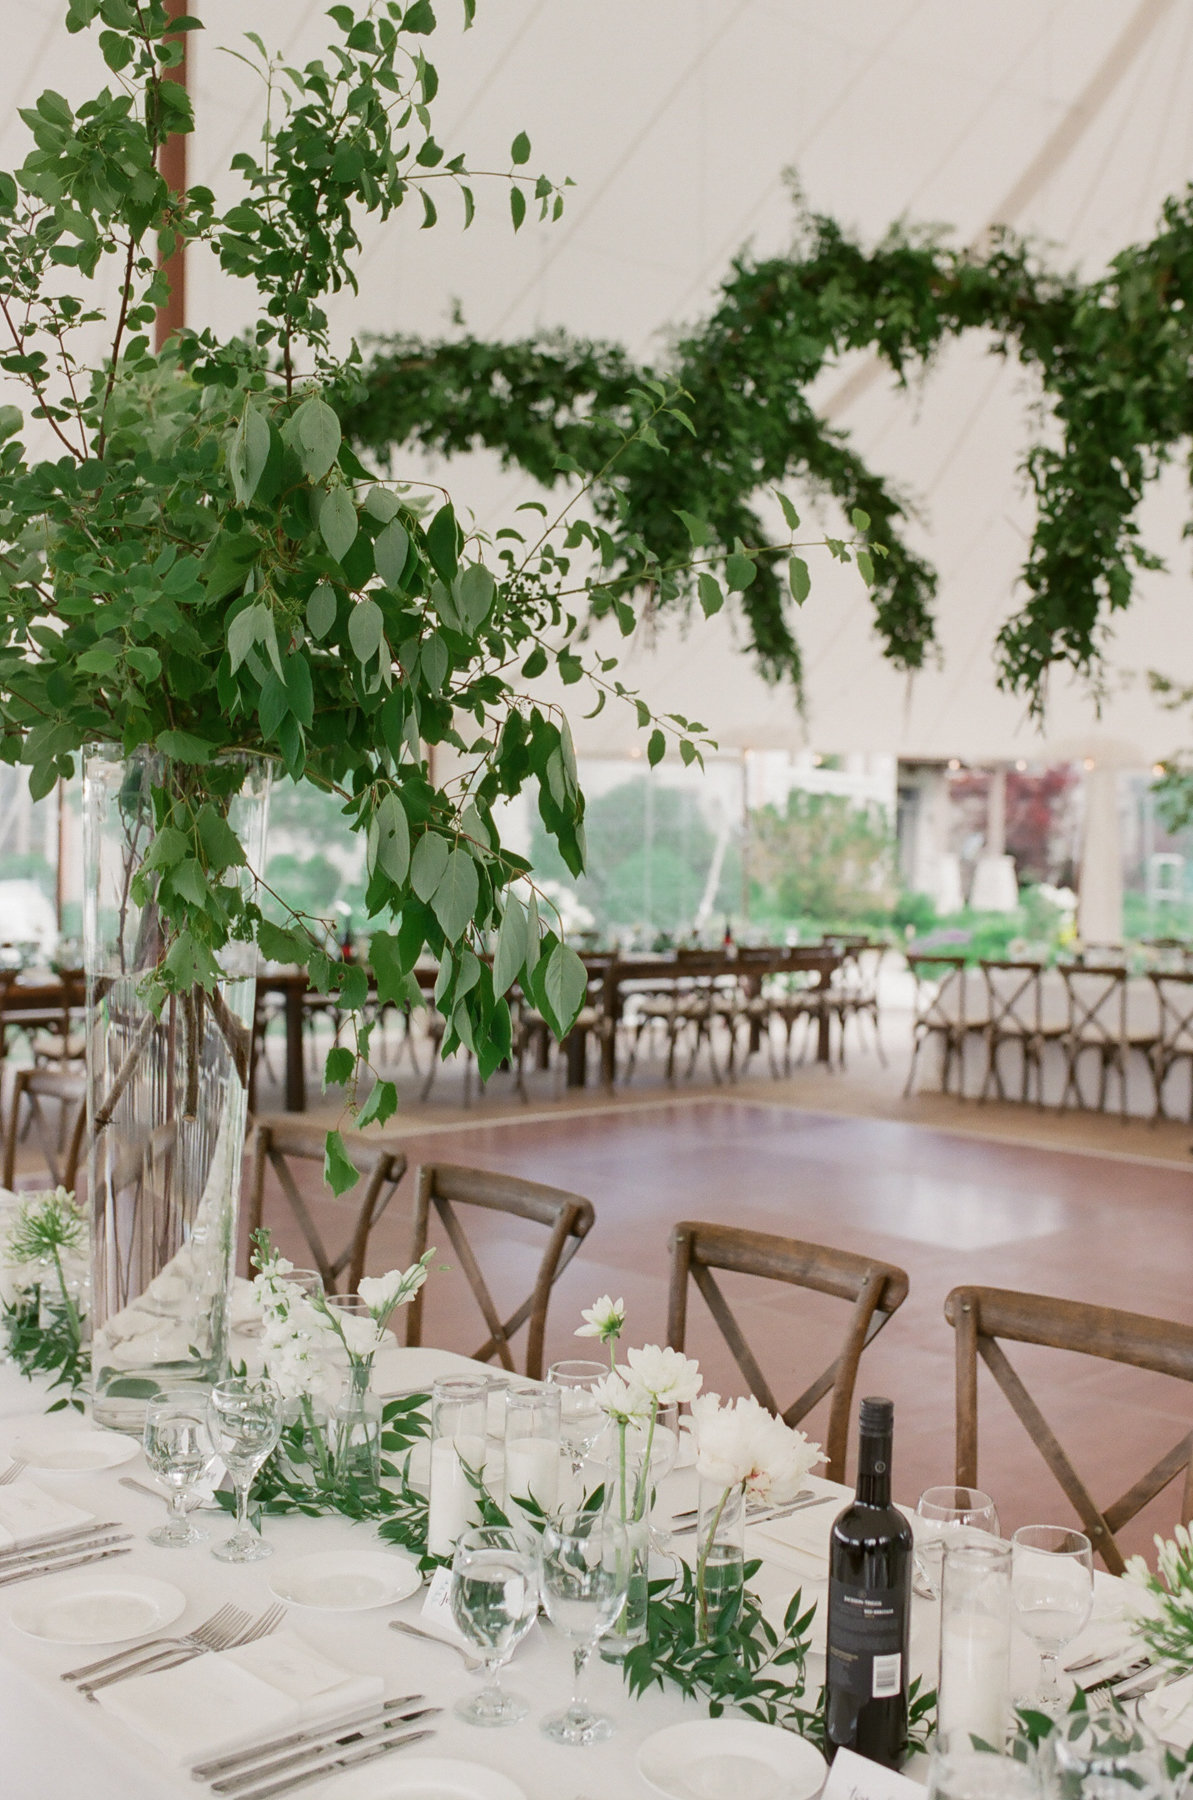 0824-maggiebrett-private-estate-wedding-000006330027.jpg